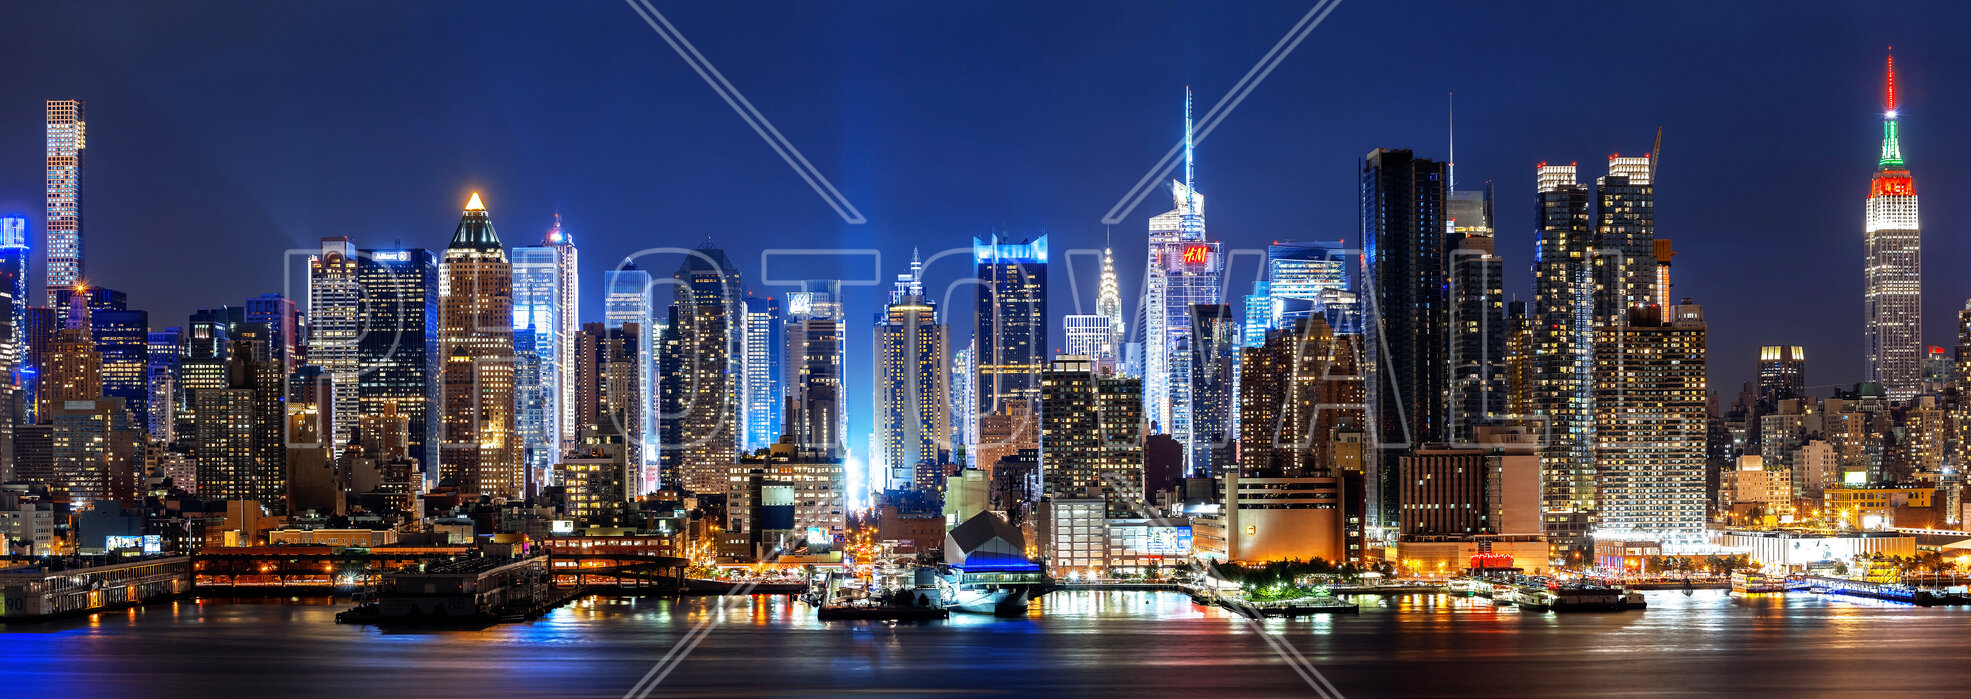 New York City Night Skyline Popular Wall Mural Photowall